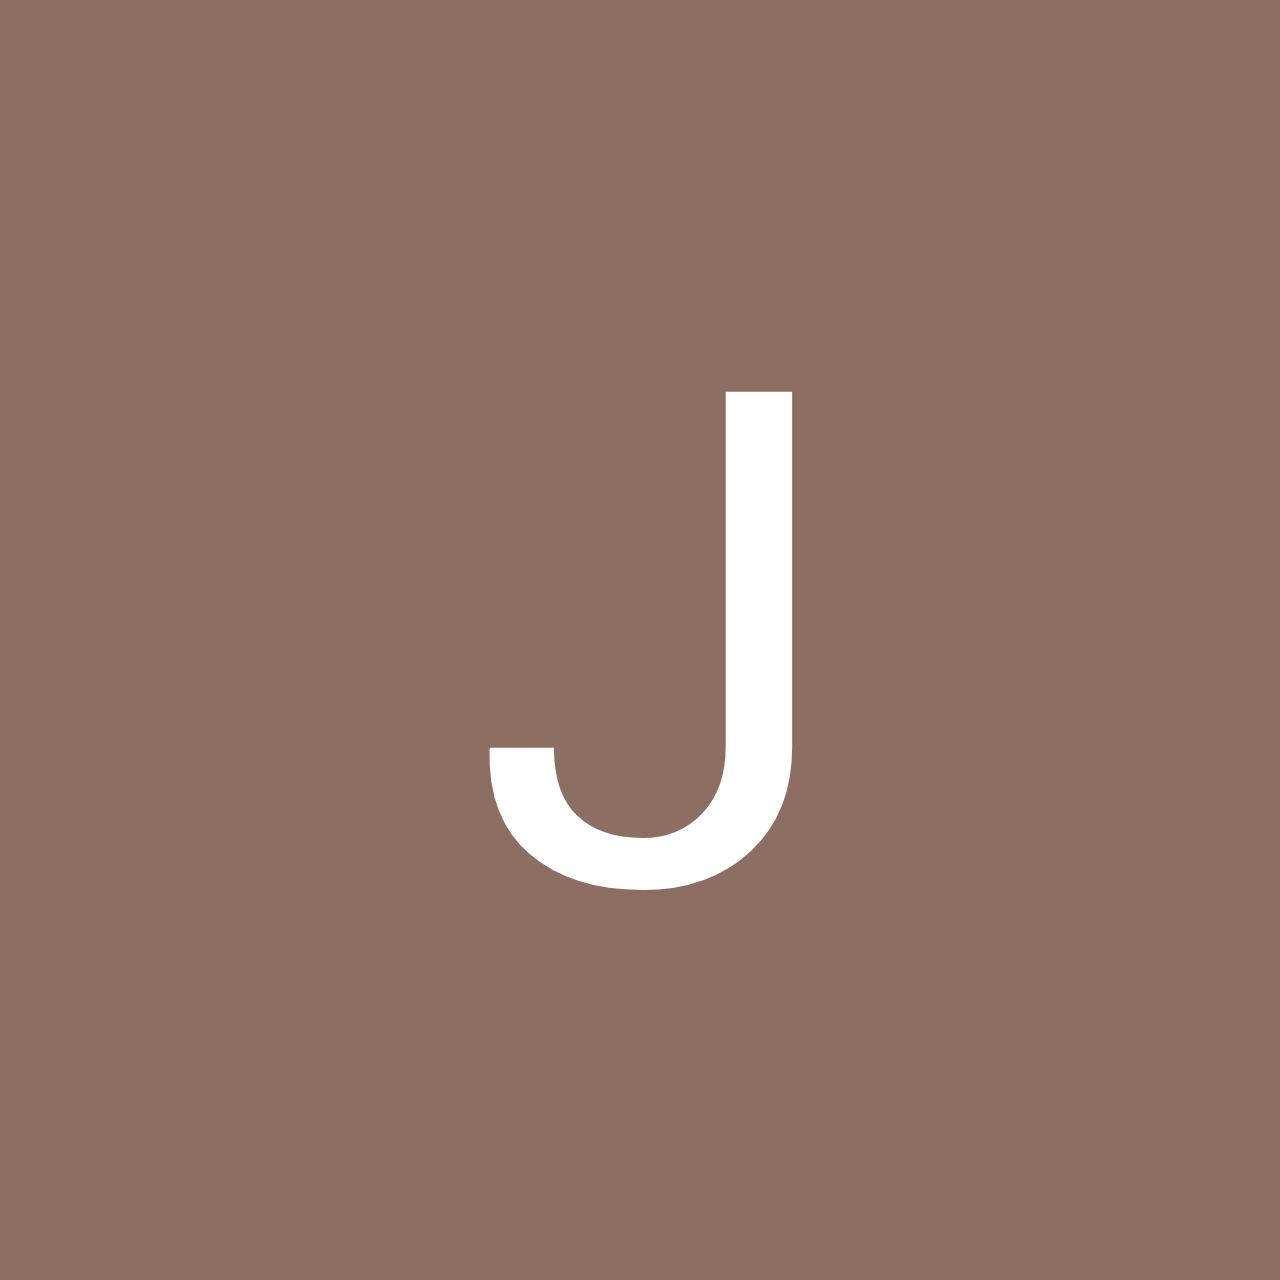 Jaytee jackson